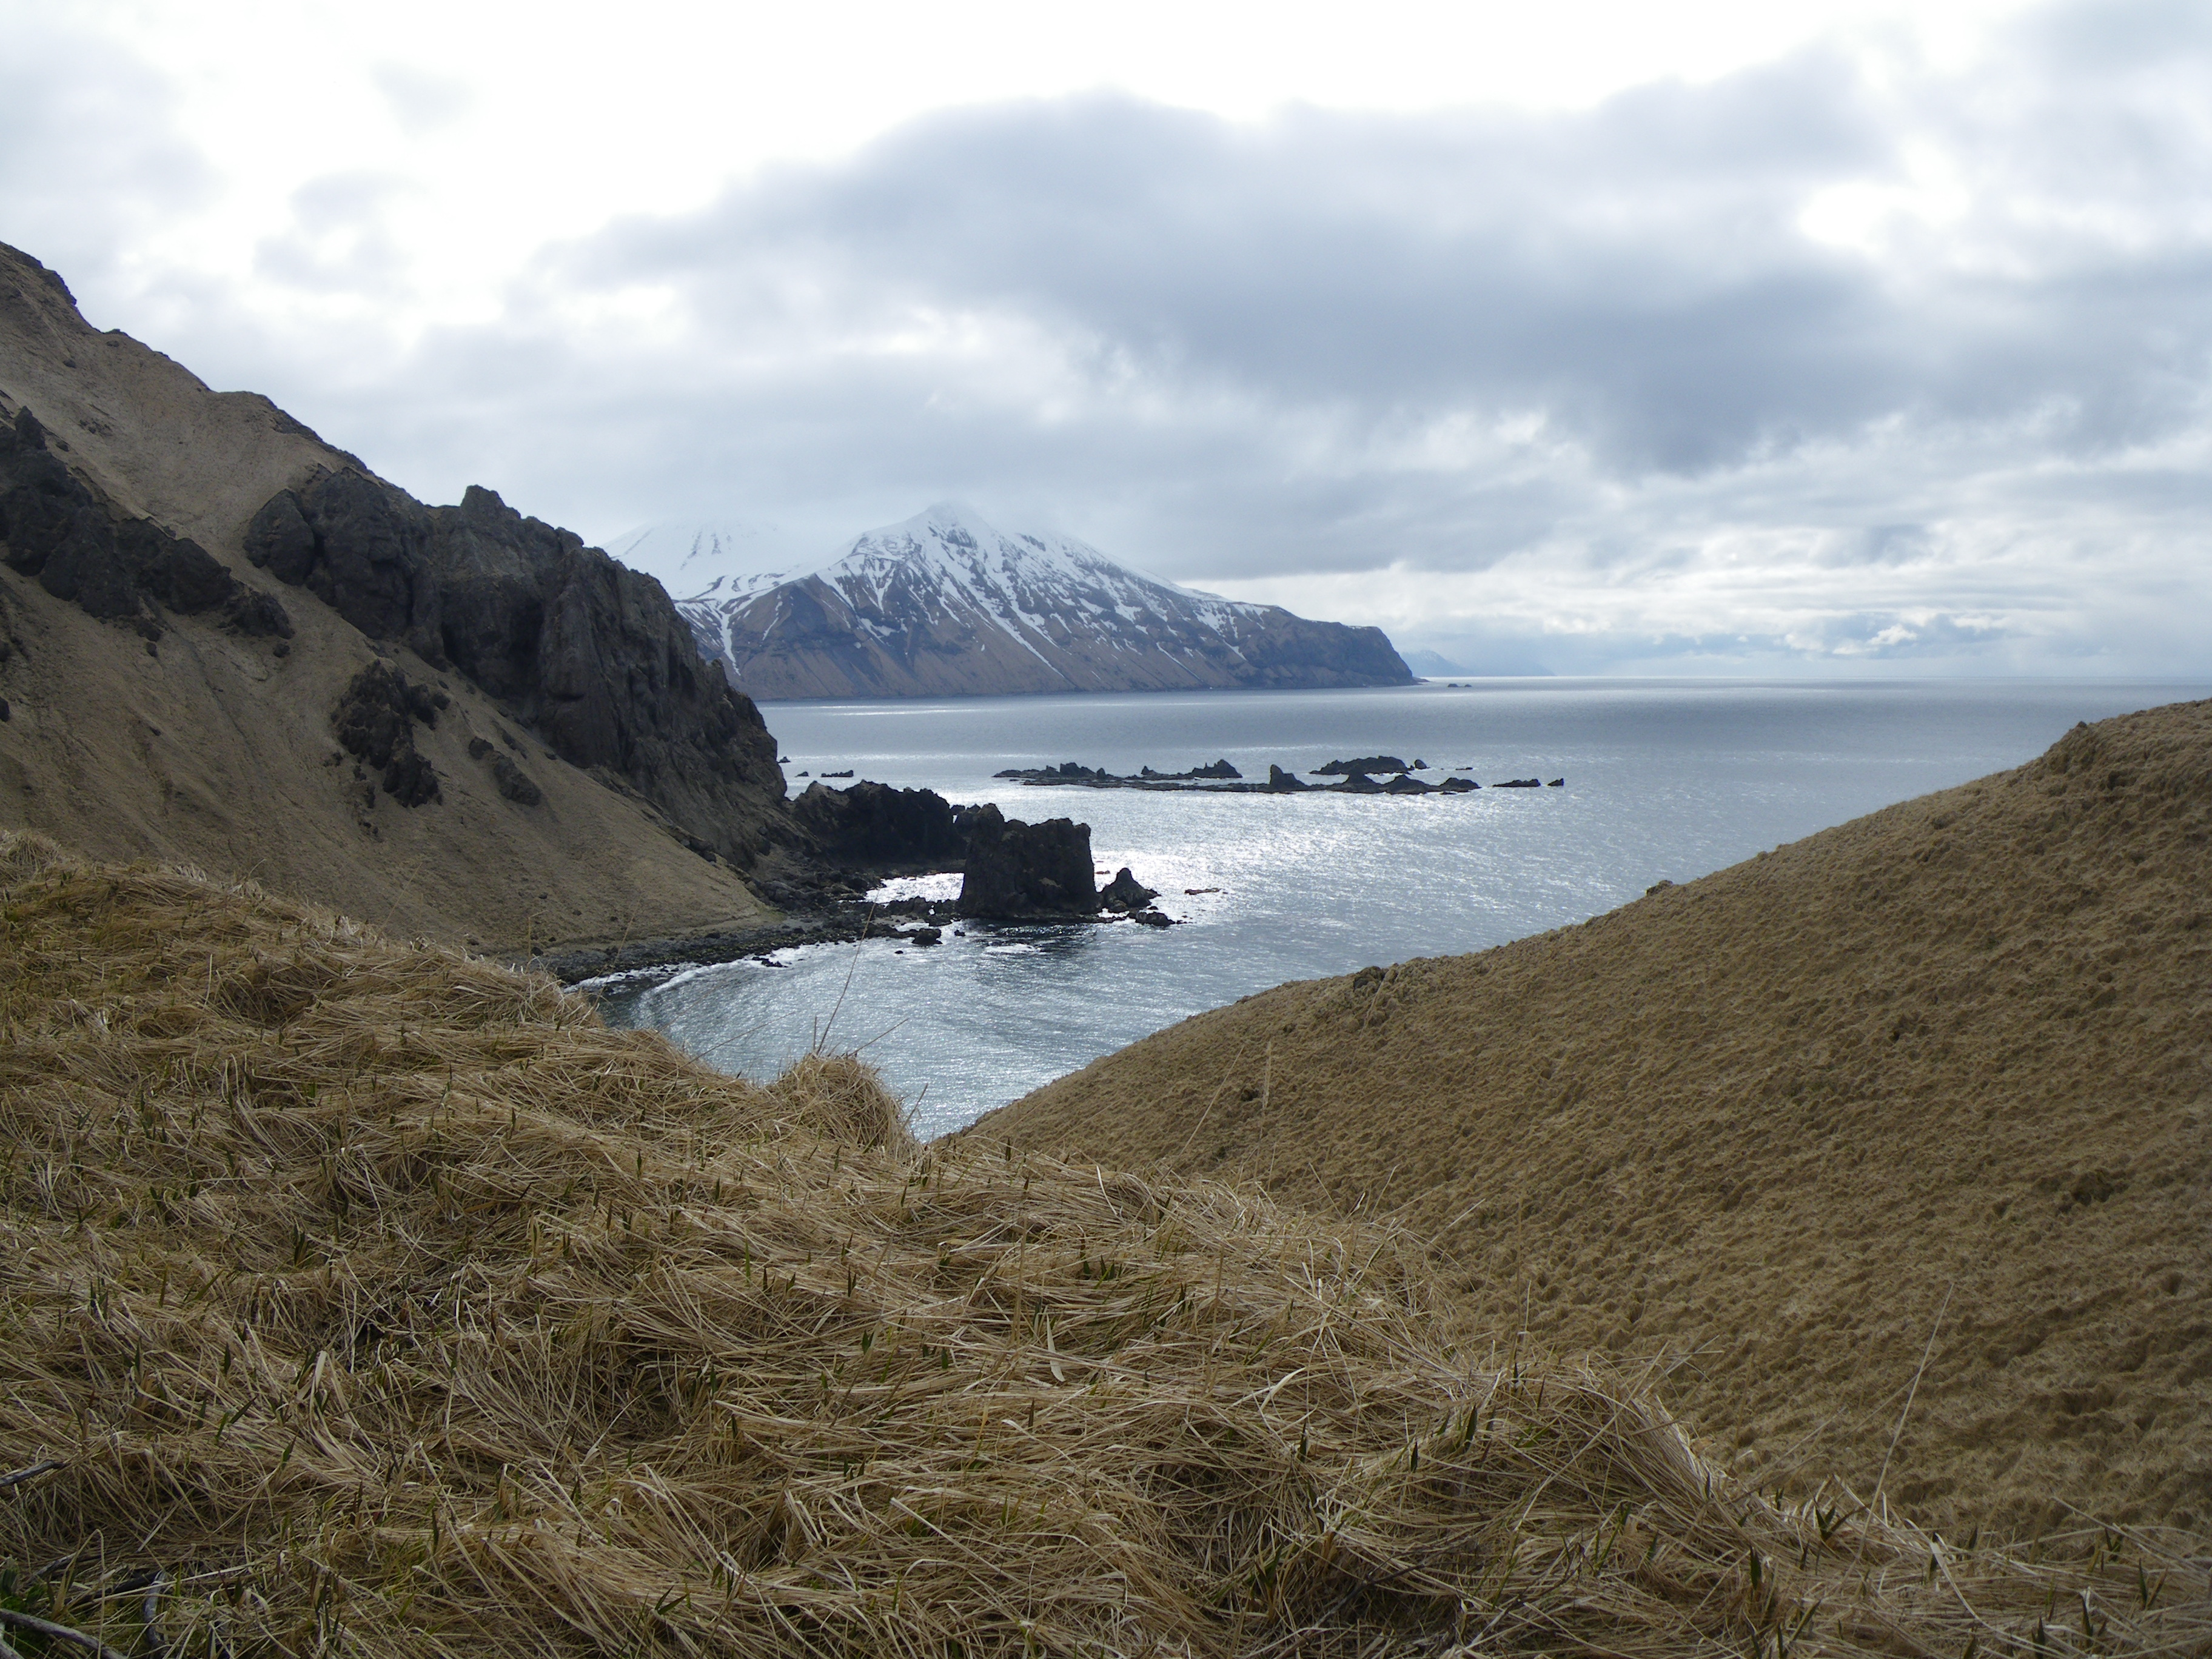 Adak Island